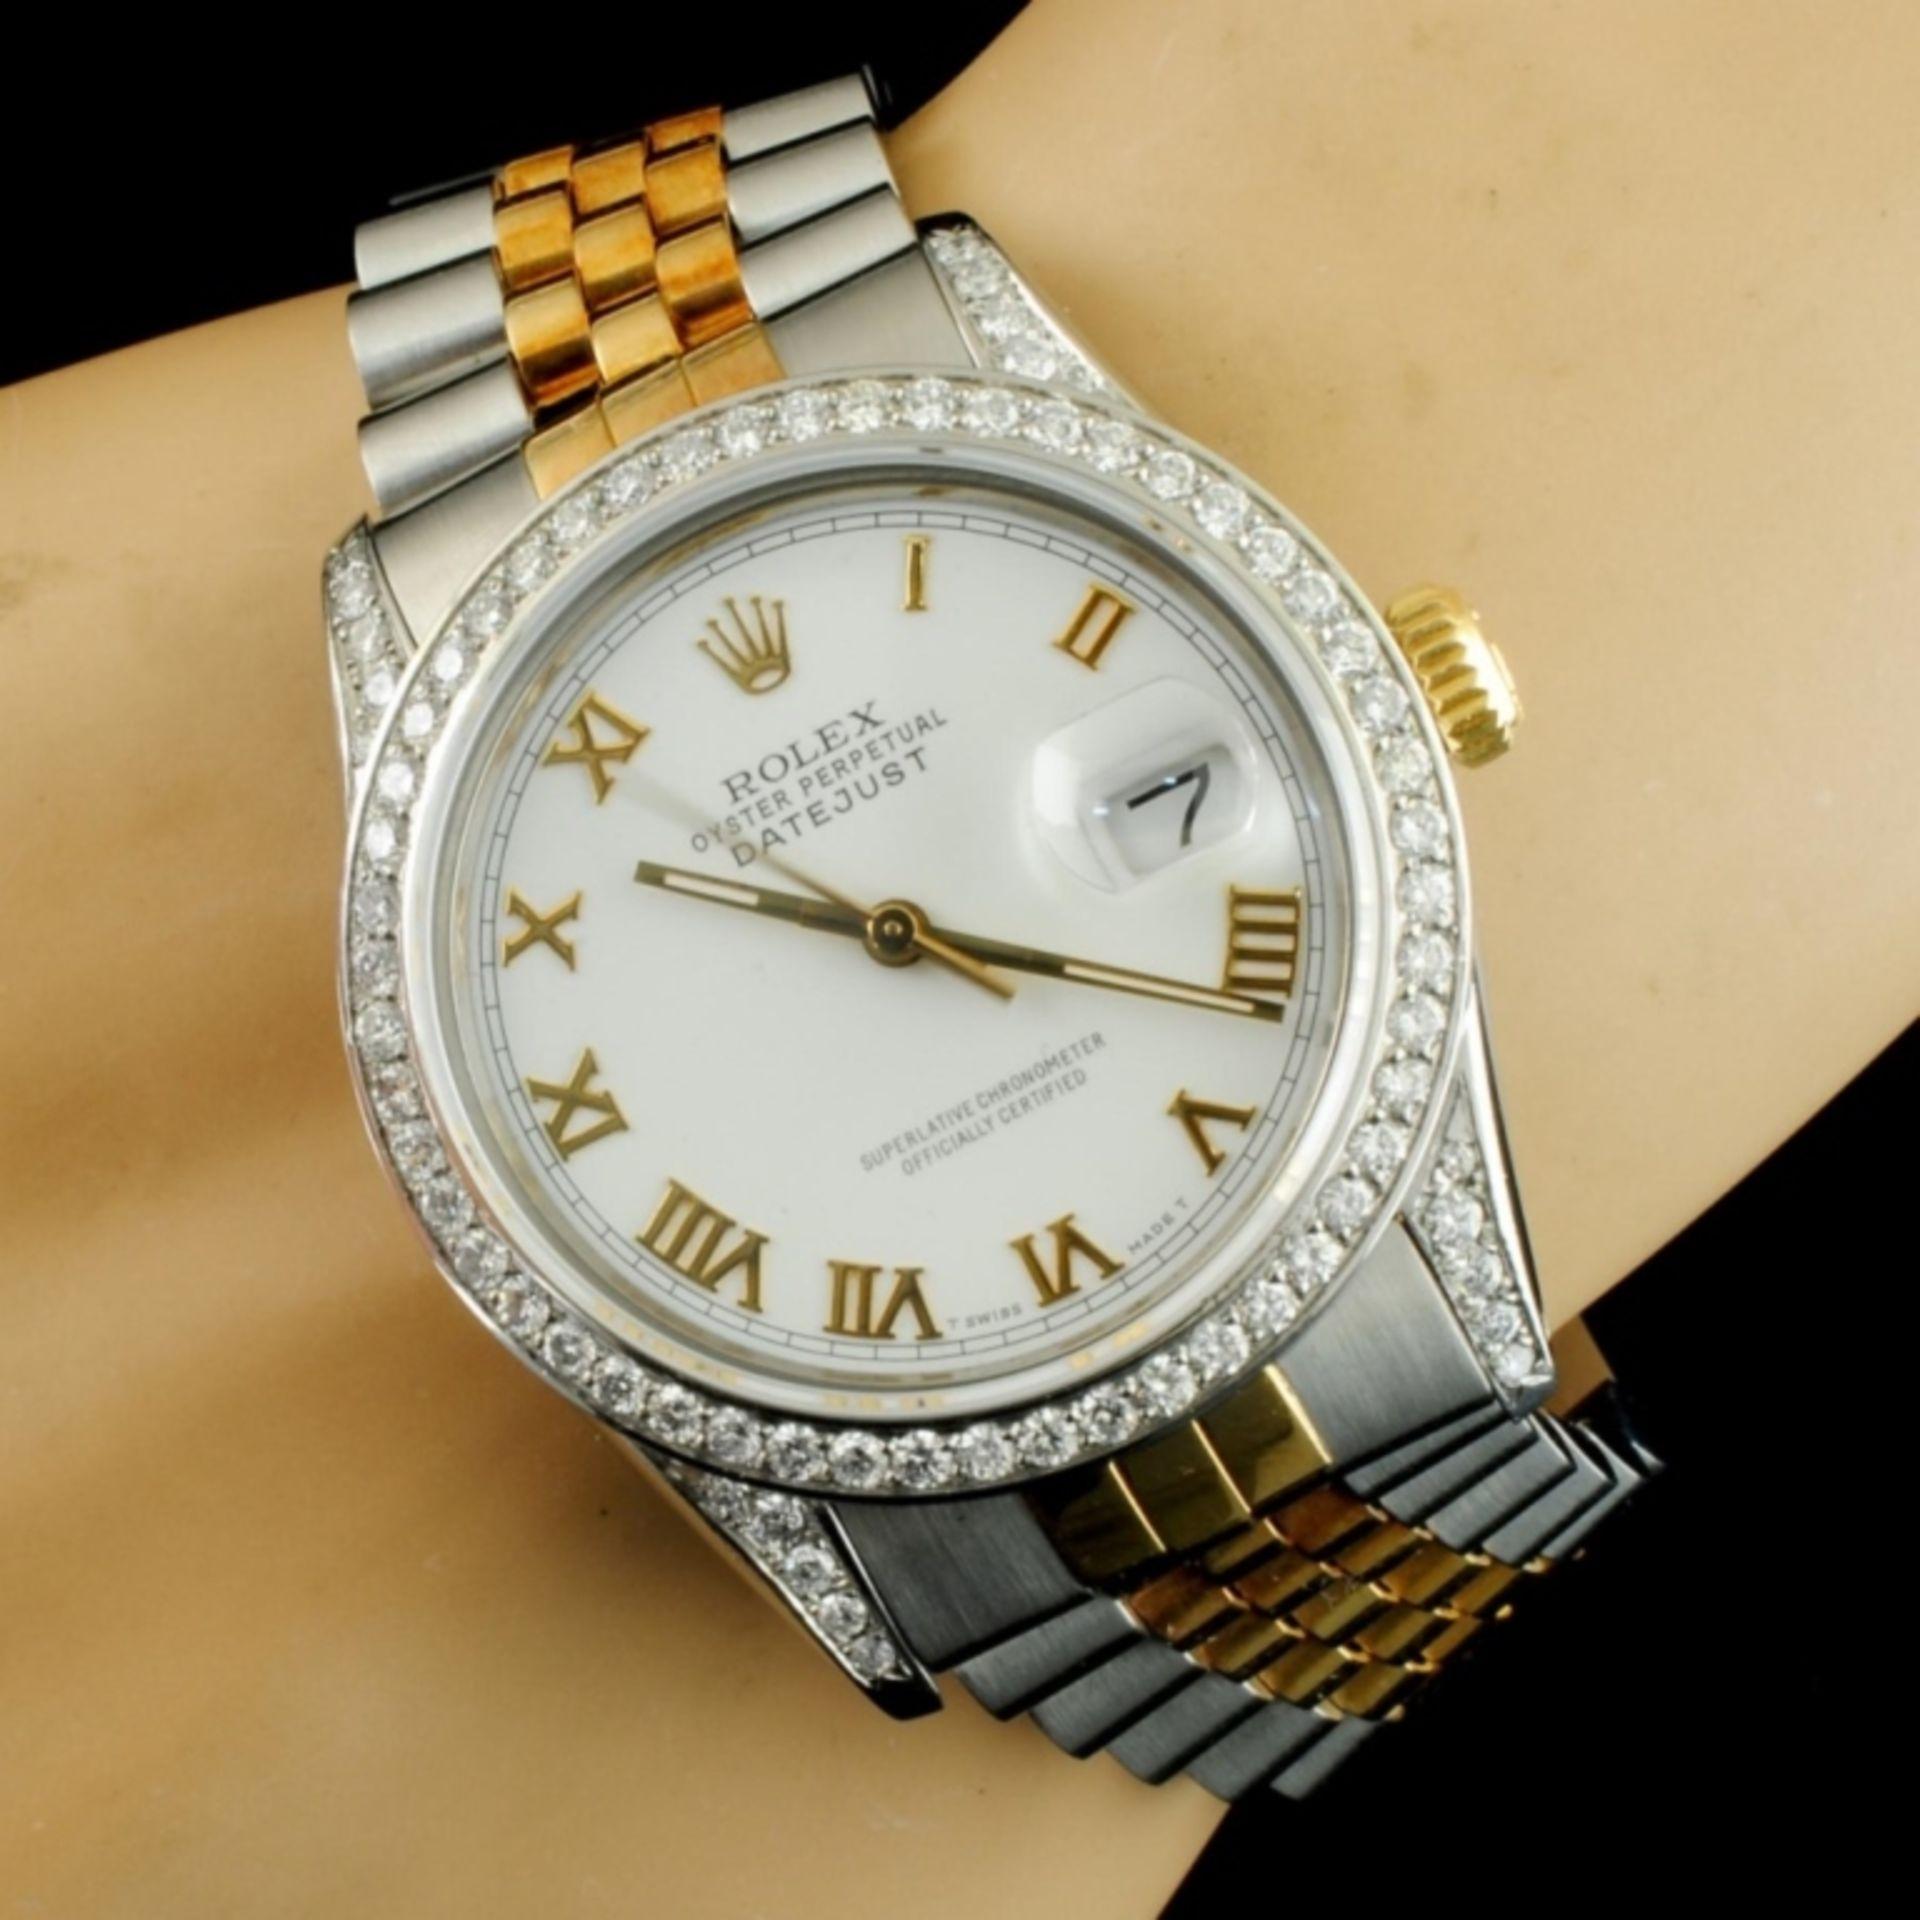 Rolex DateJust 1.50ctw Diamond 36MM Wristwatch - Image 4 of 5